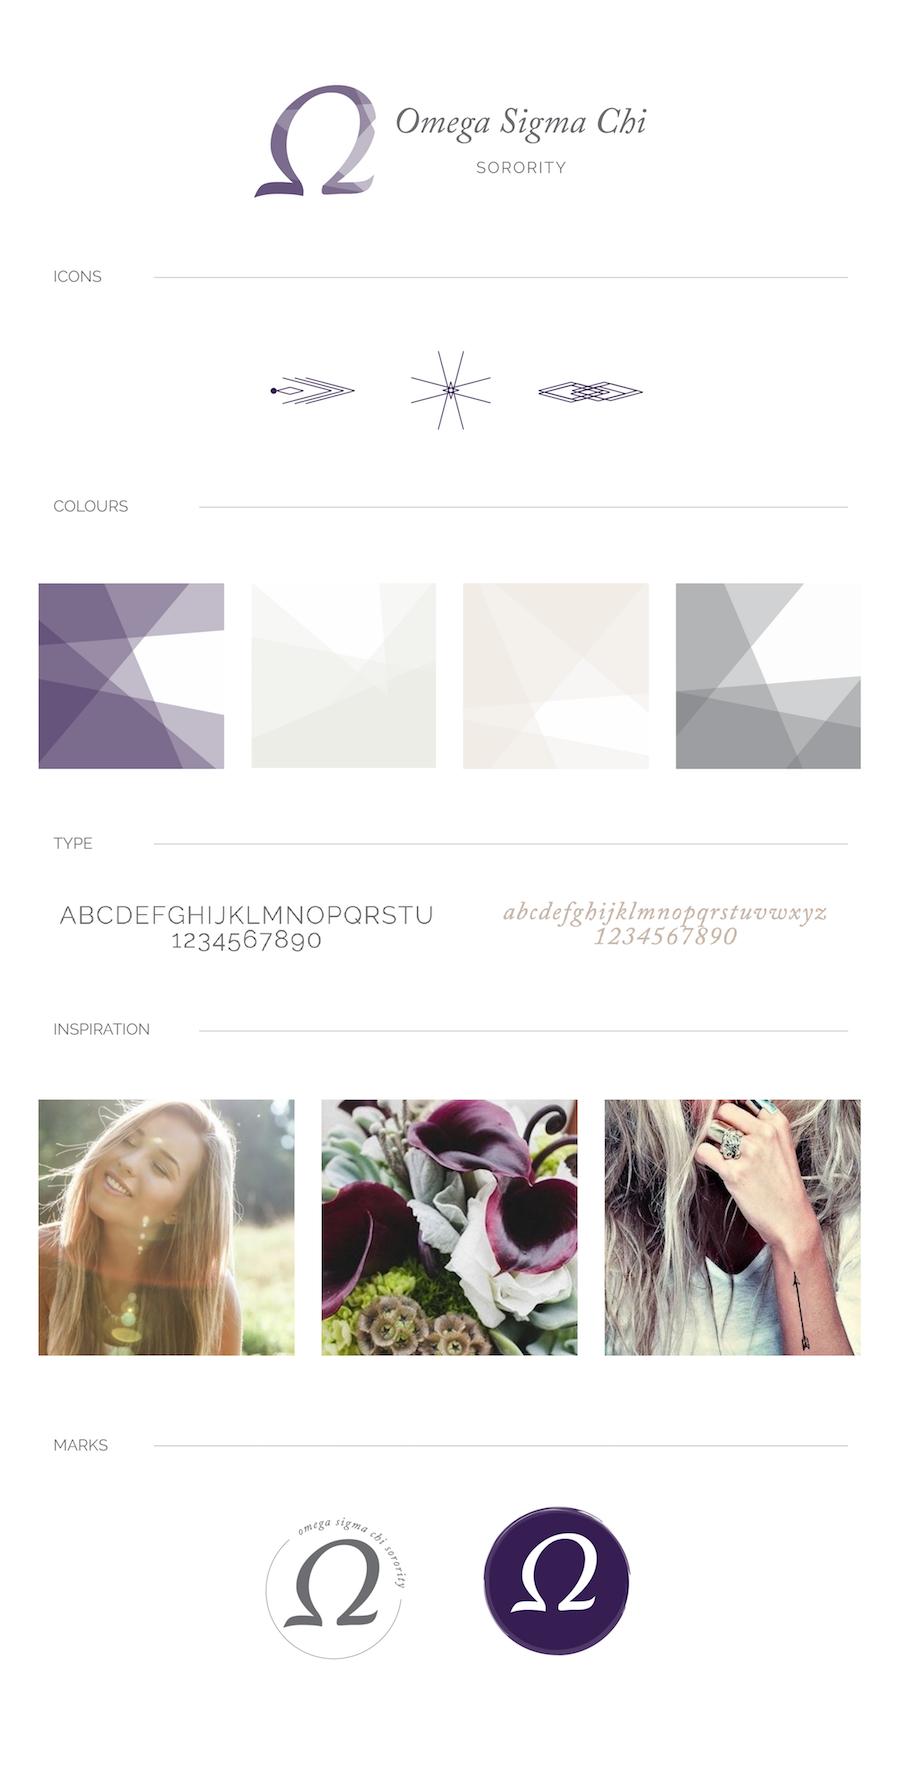 mood board and color palette - whimsical, feminine, purple